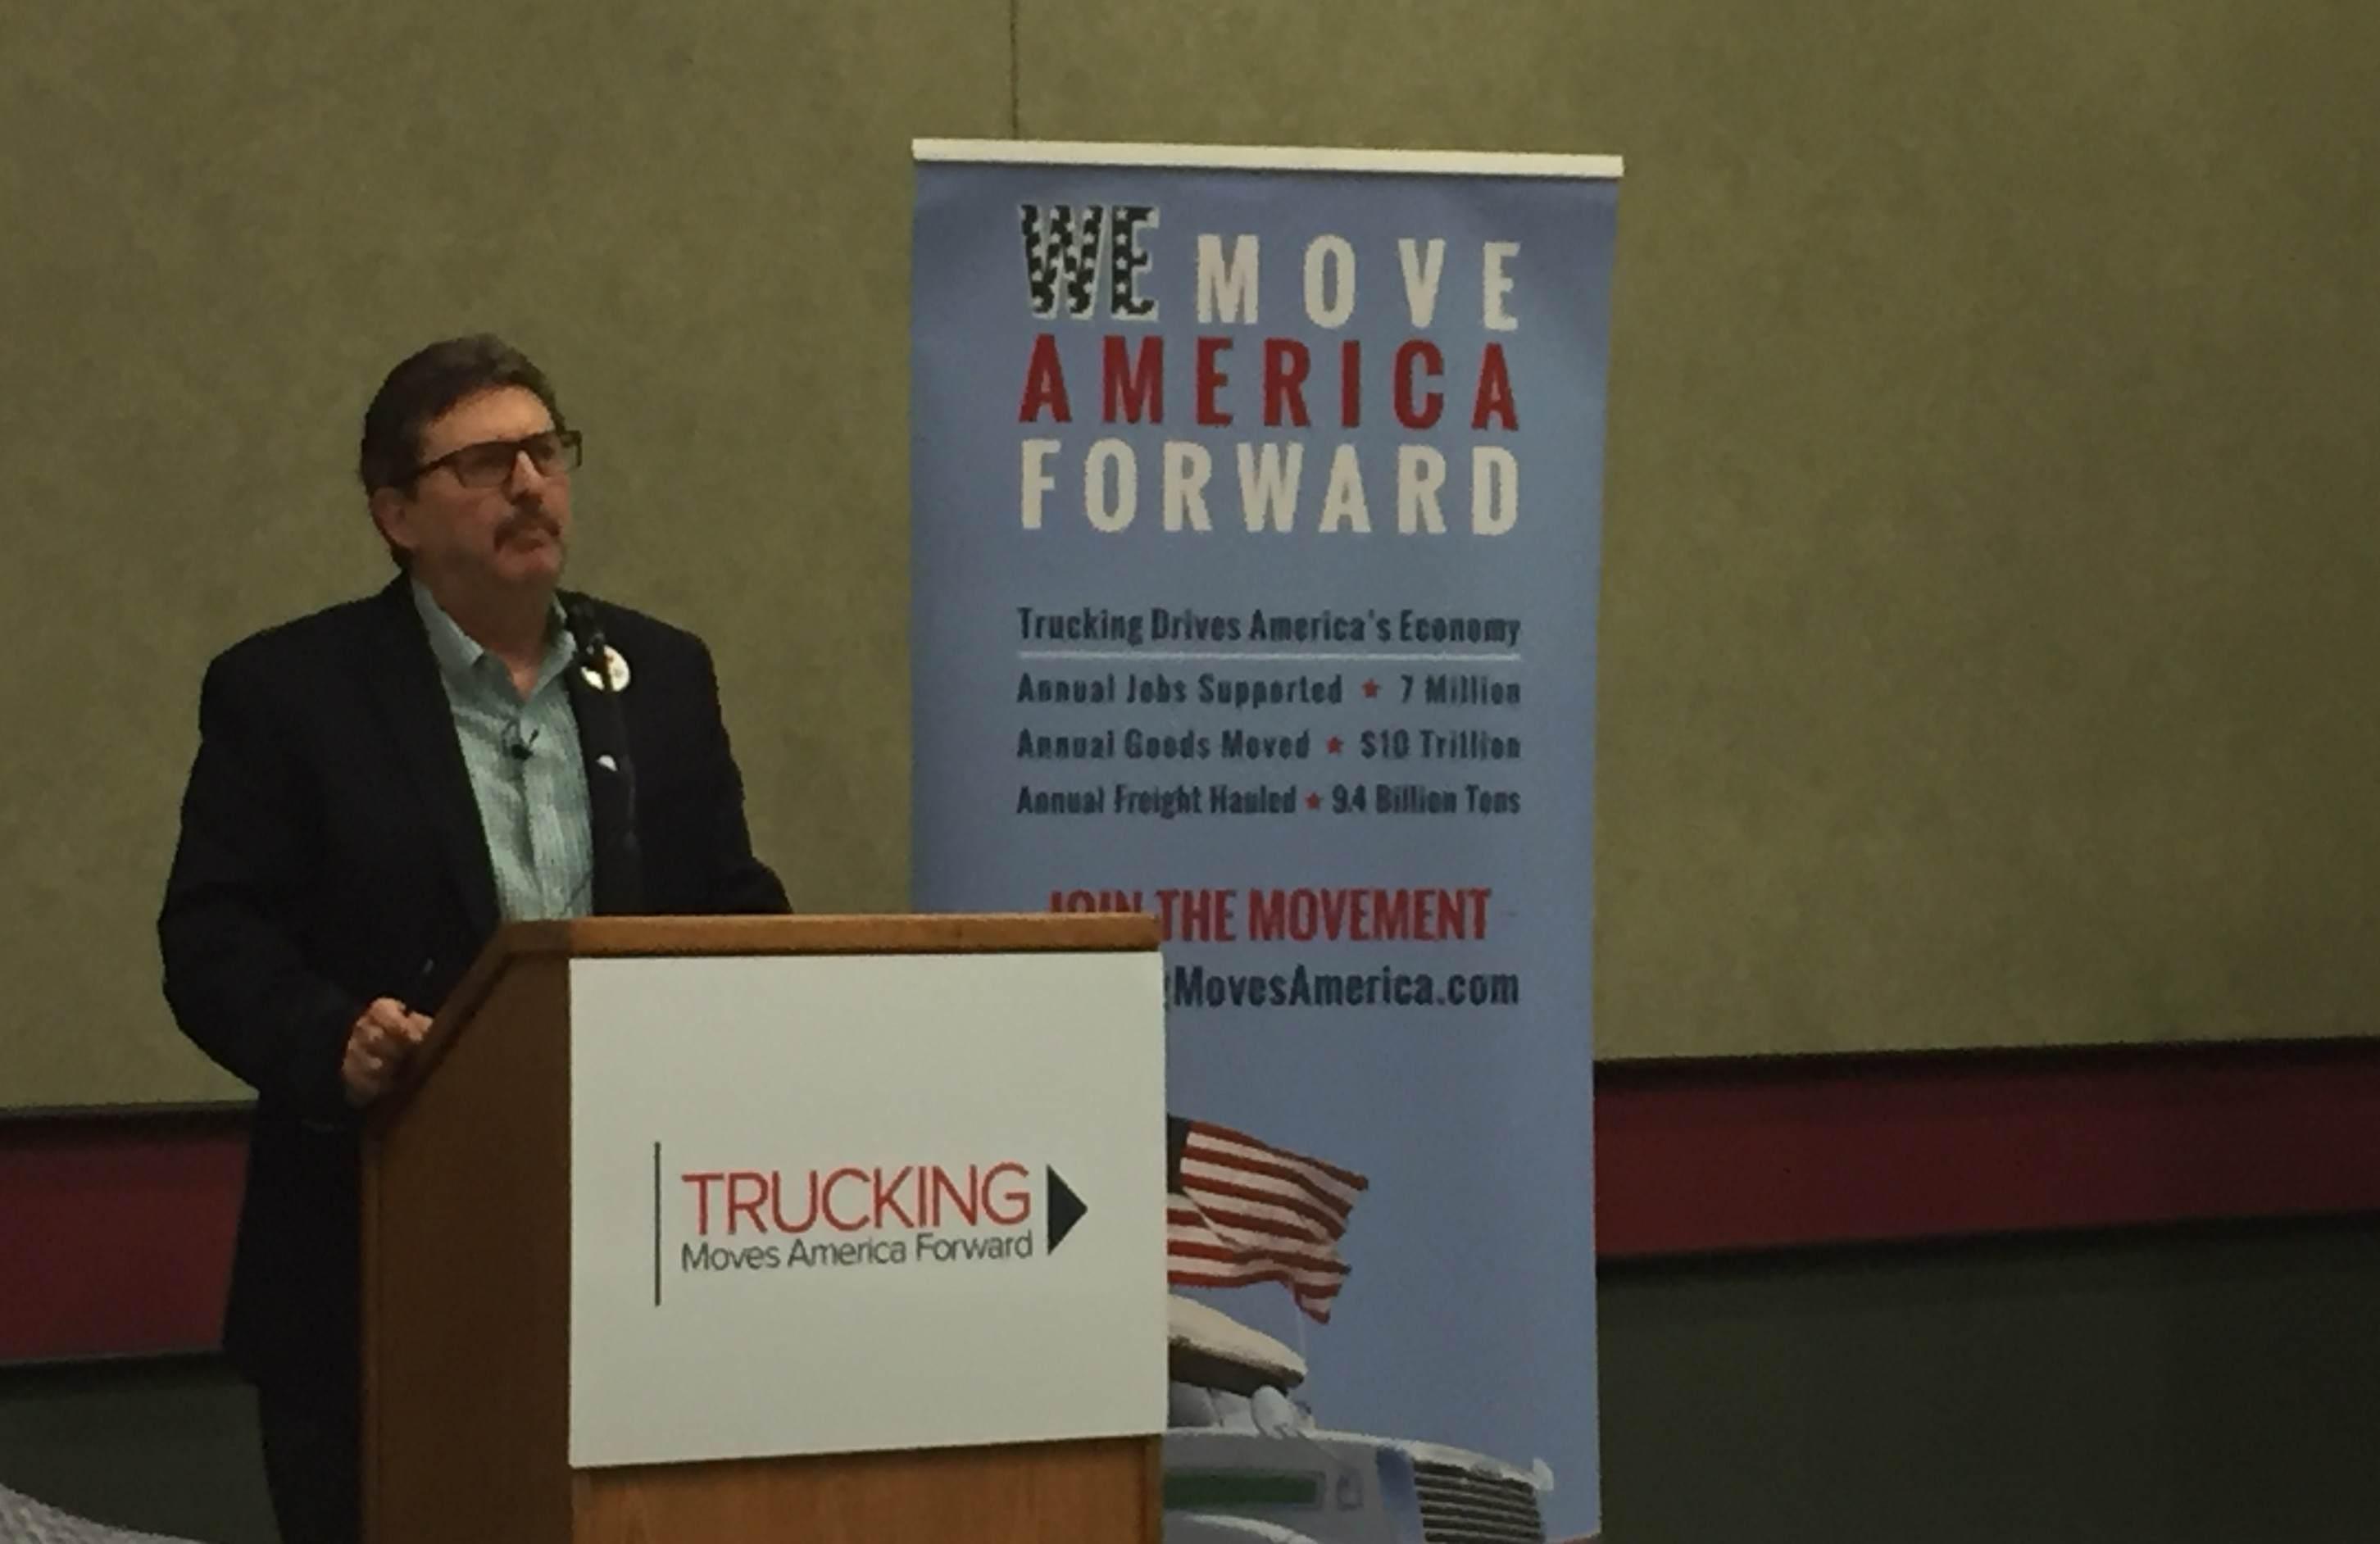 Trucking Moves America Forward sets 2016 goals